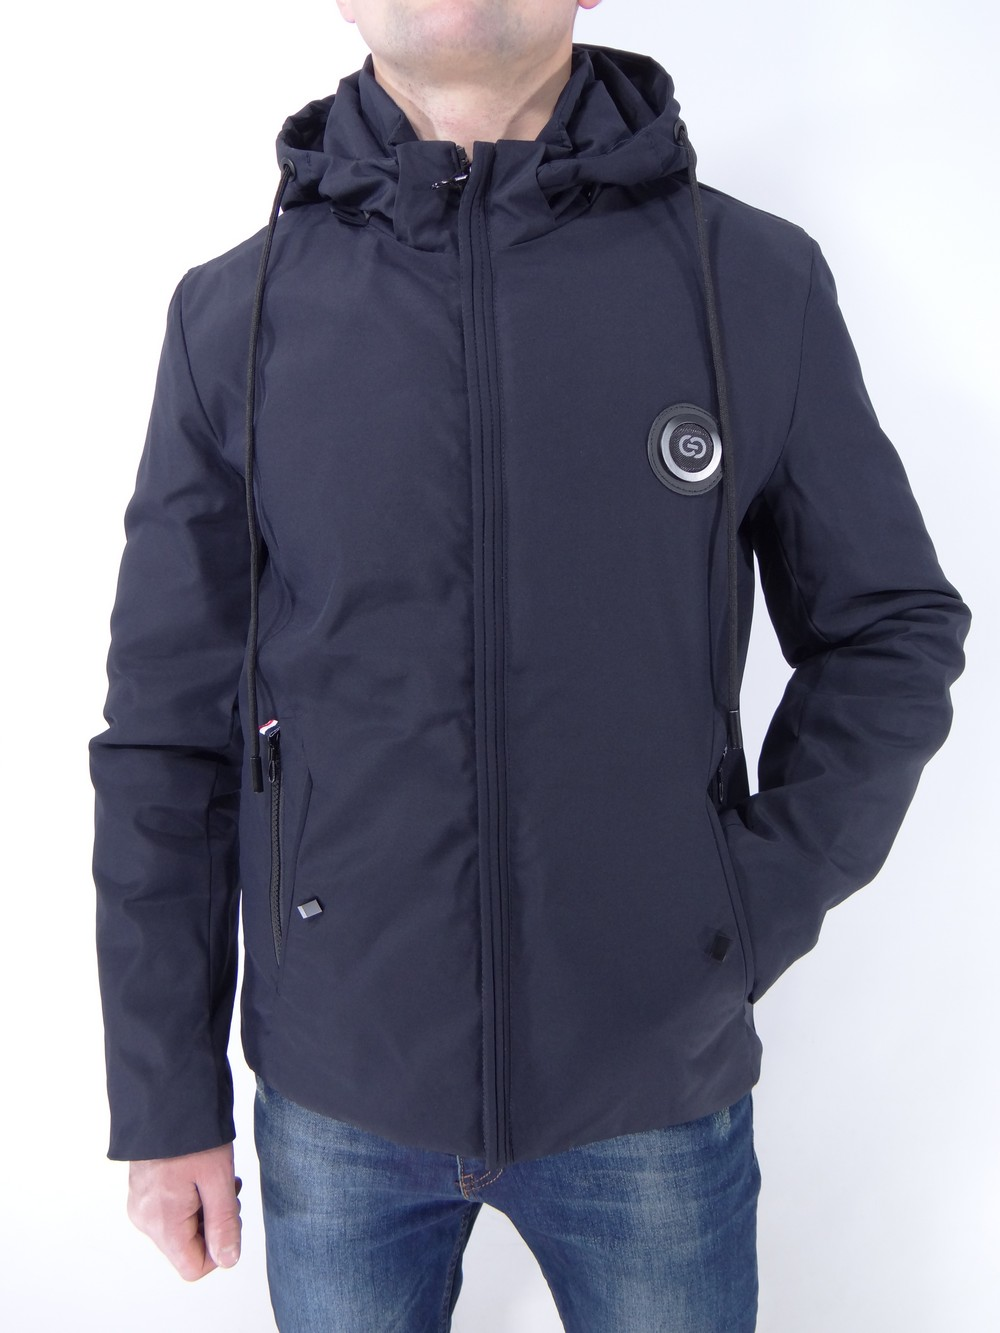 Легкая куртка Luzhilu